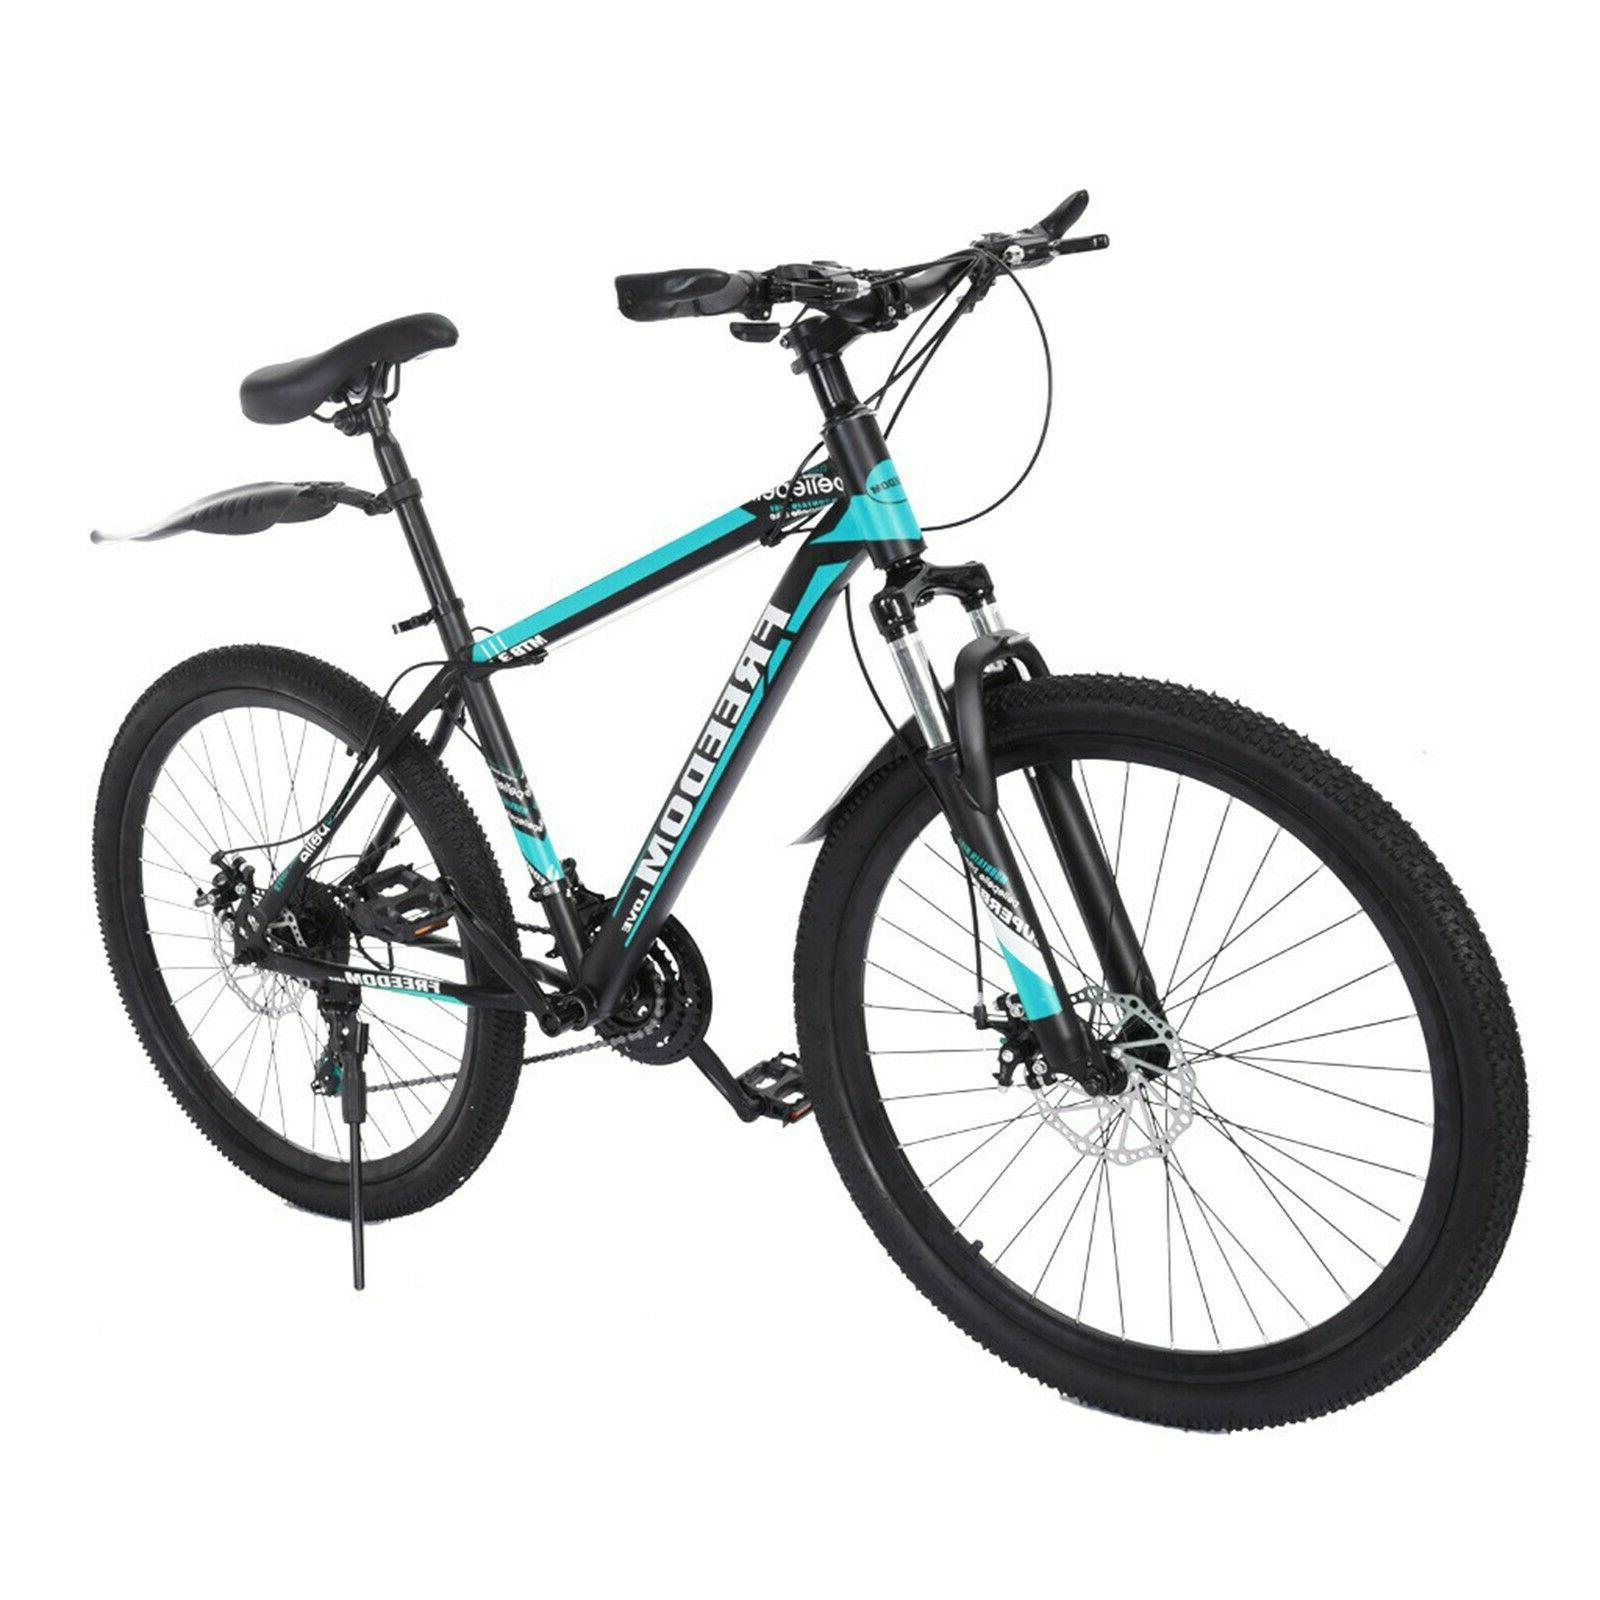 21 Disc Women&Men's Bikes Bicycle